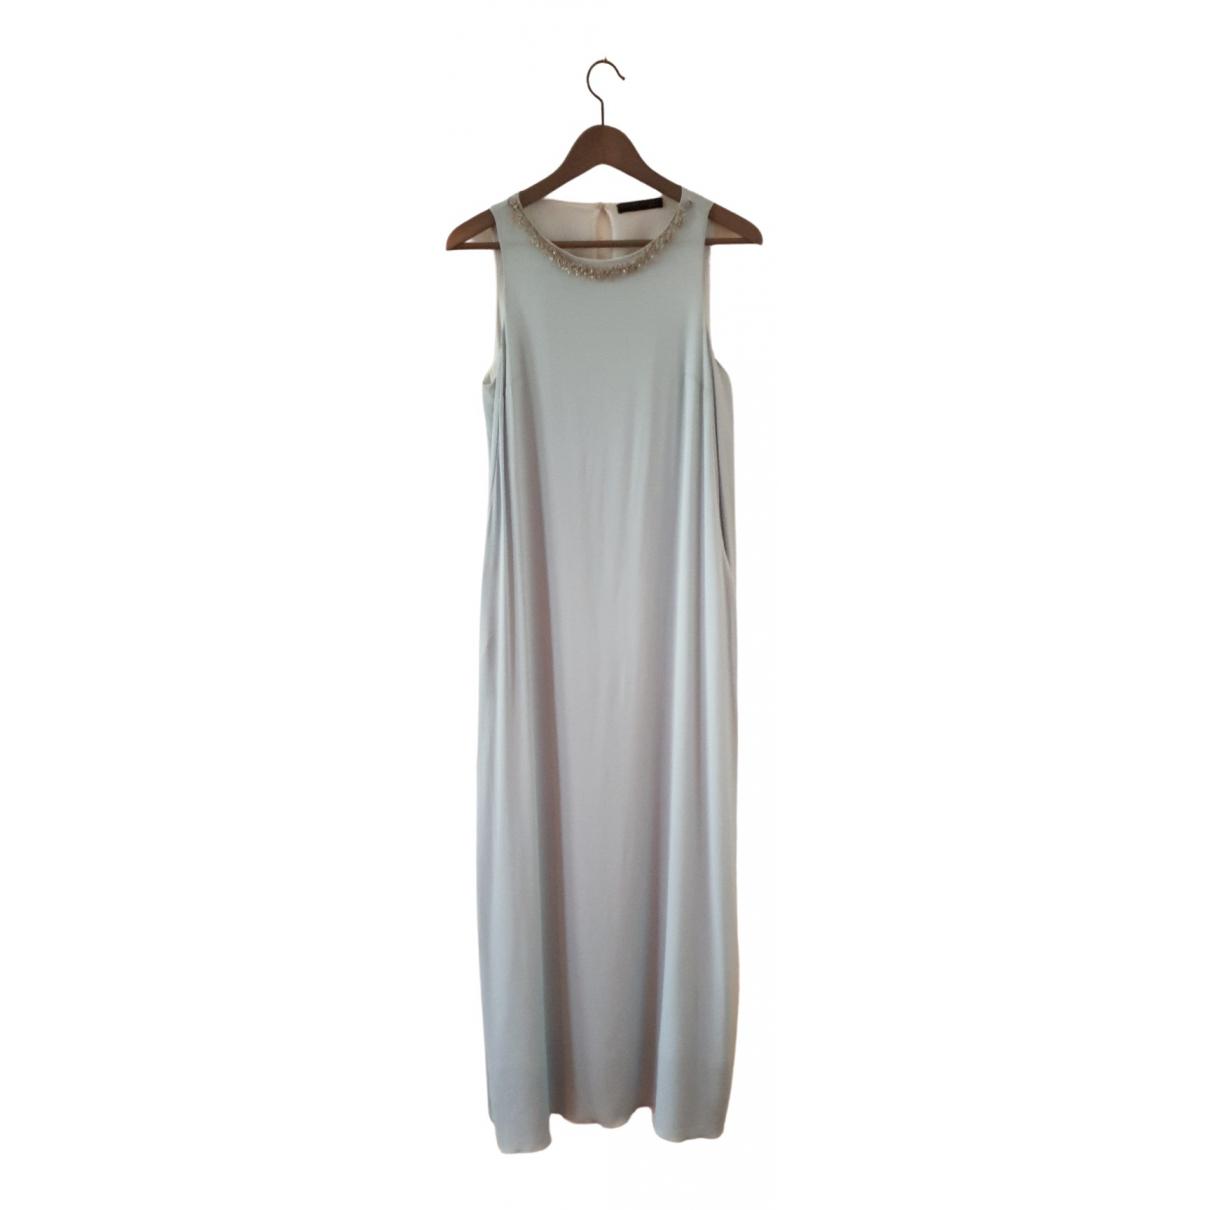 Fabiana Filippi \N Silk dress for Women 42 IT